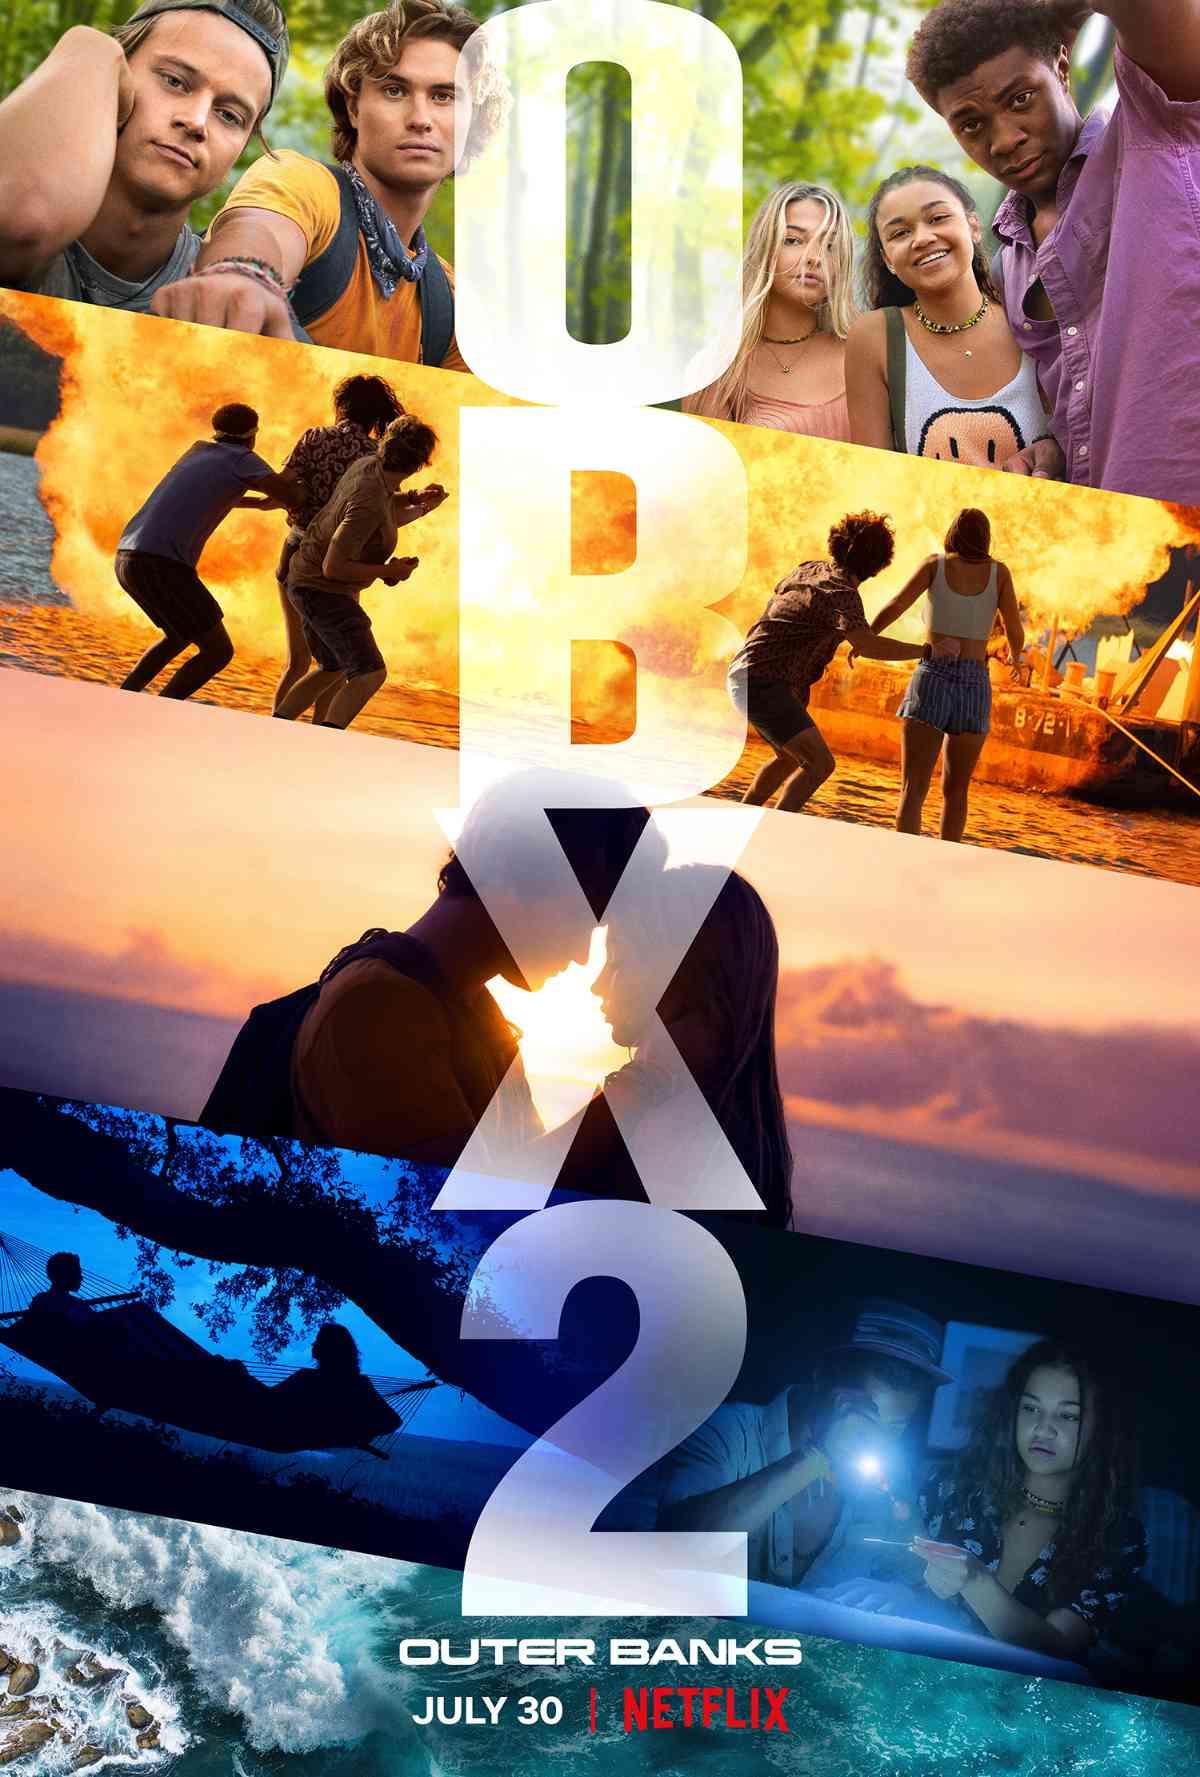 Outer Banks Season 2 Poster